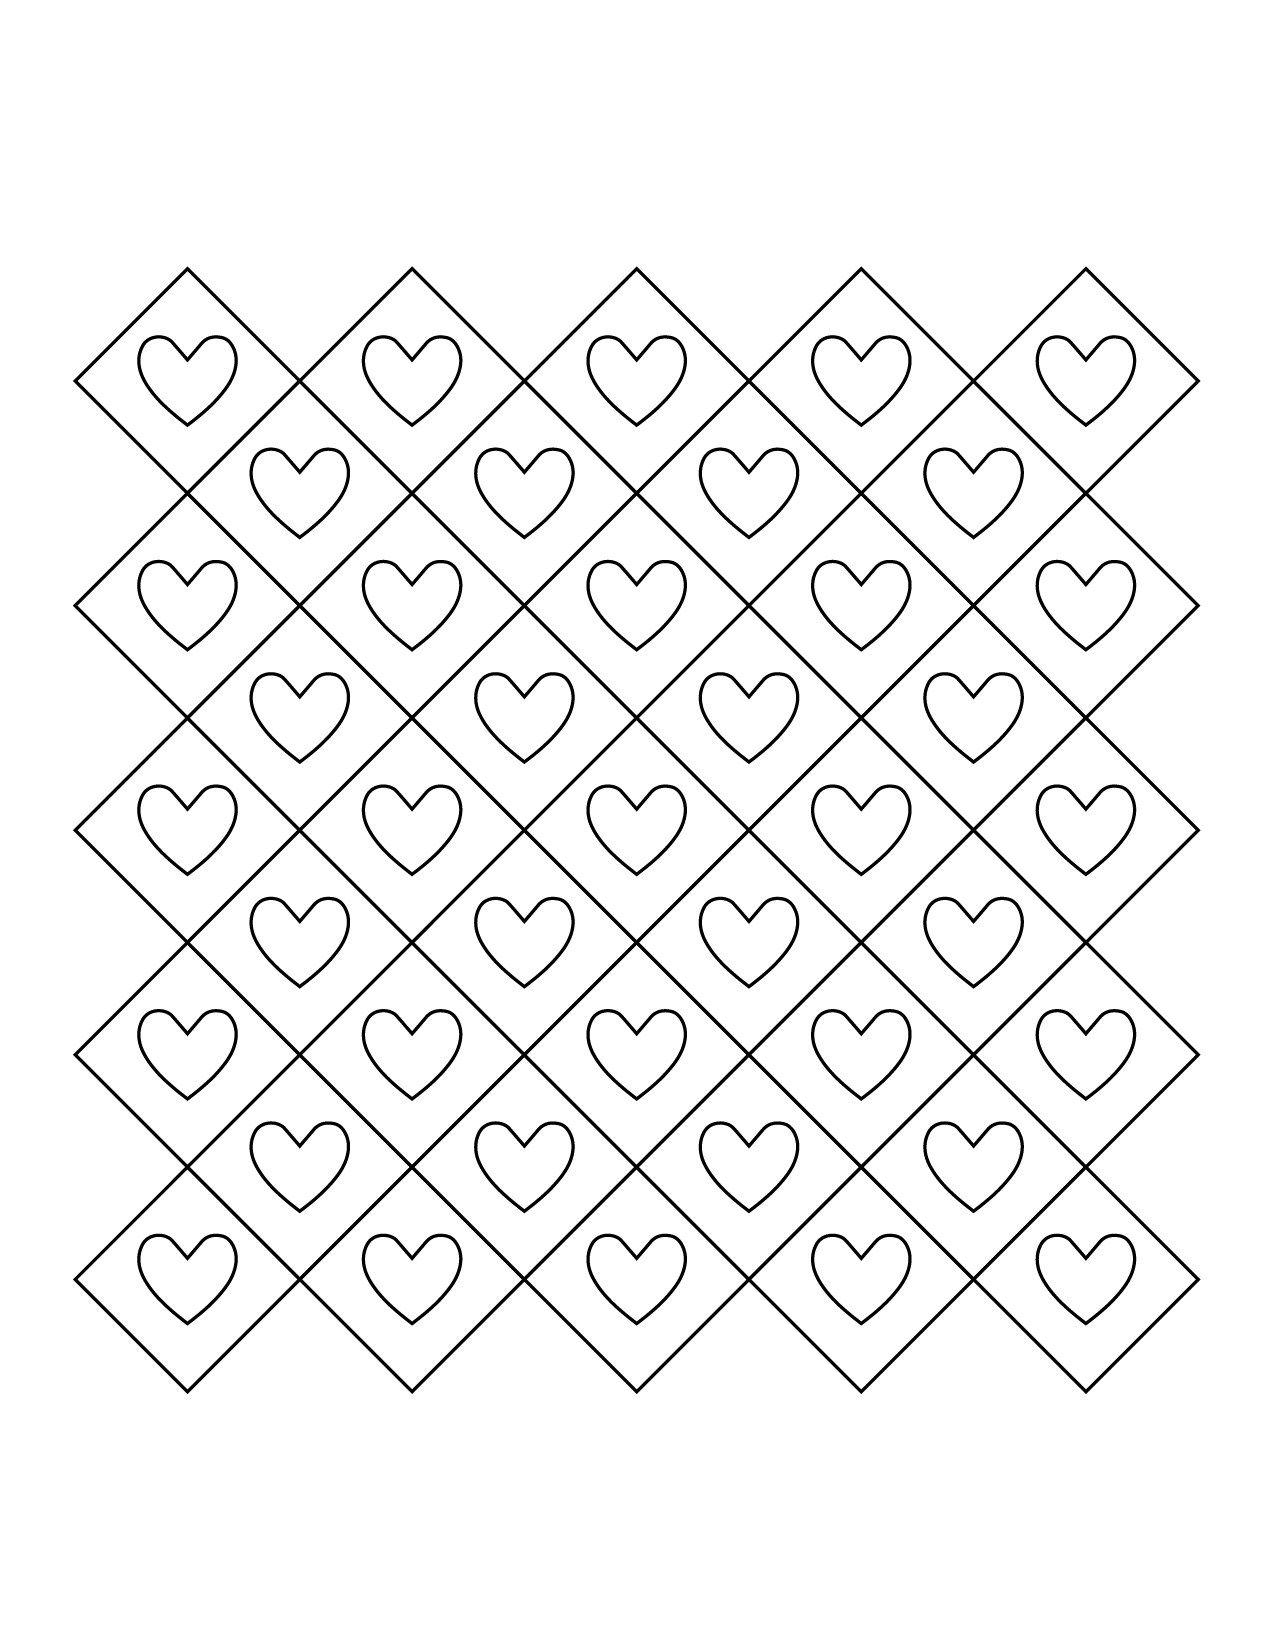 3d heart granny square baby blanket pattern-01 | Crochet Baby ...